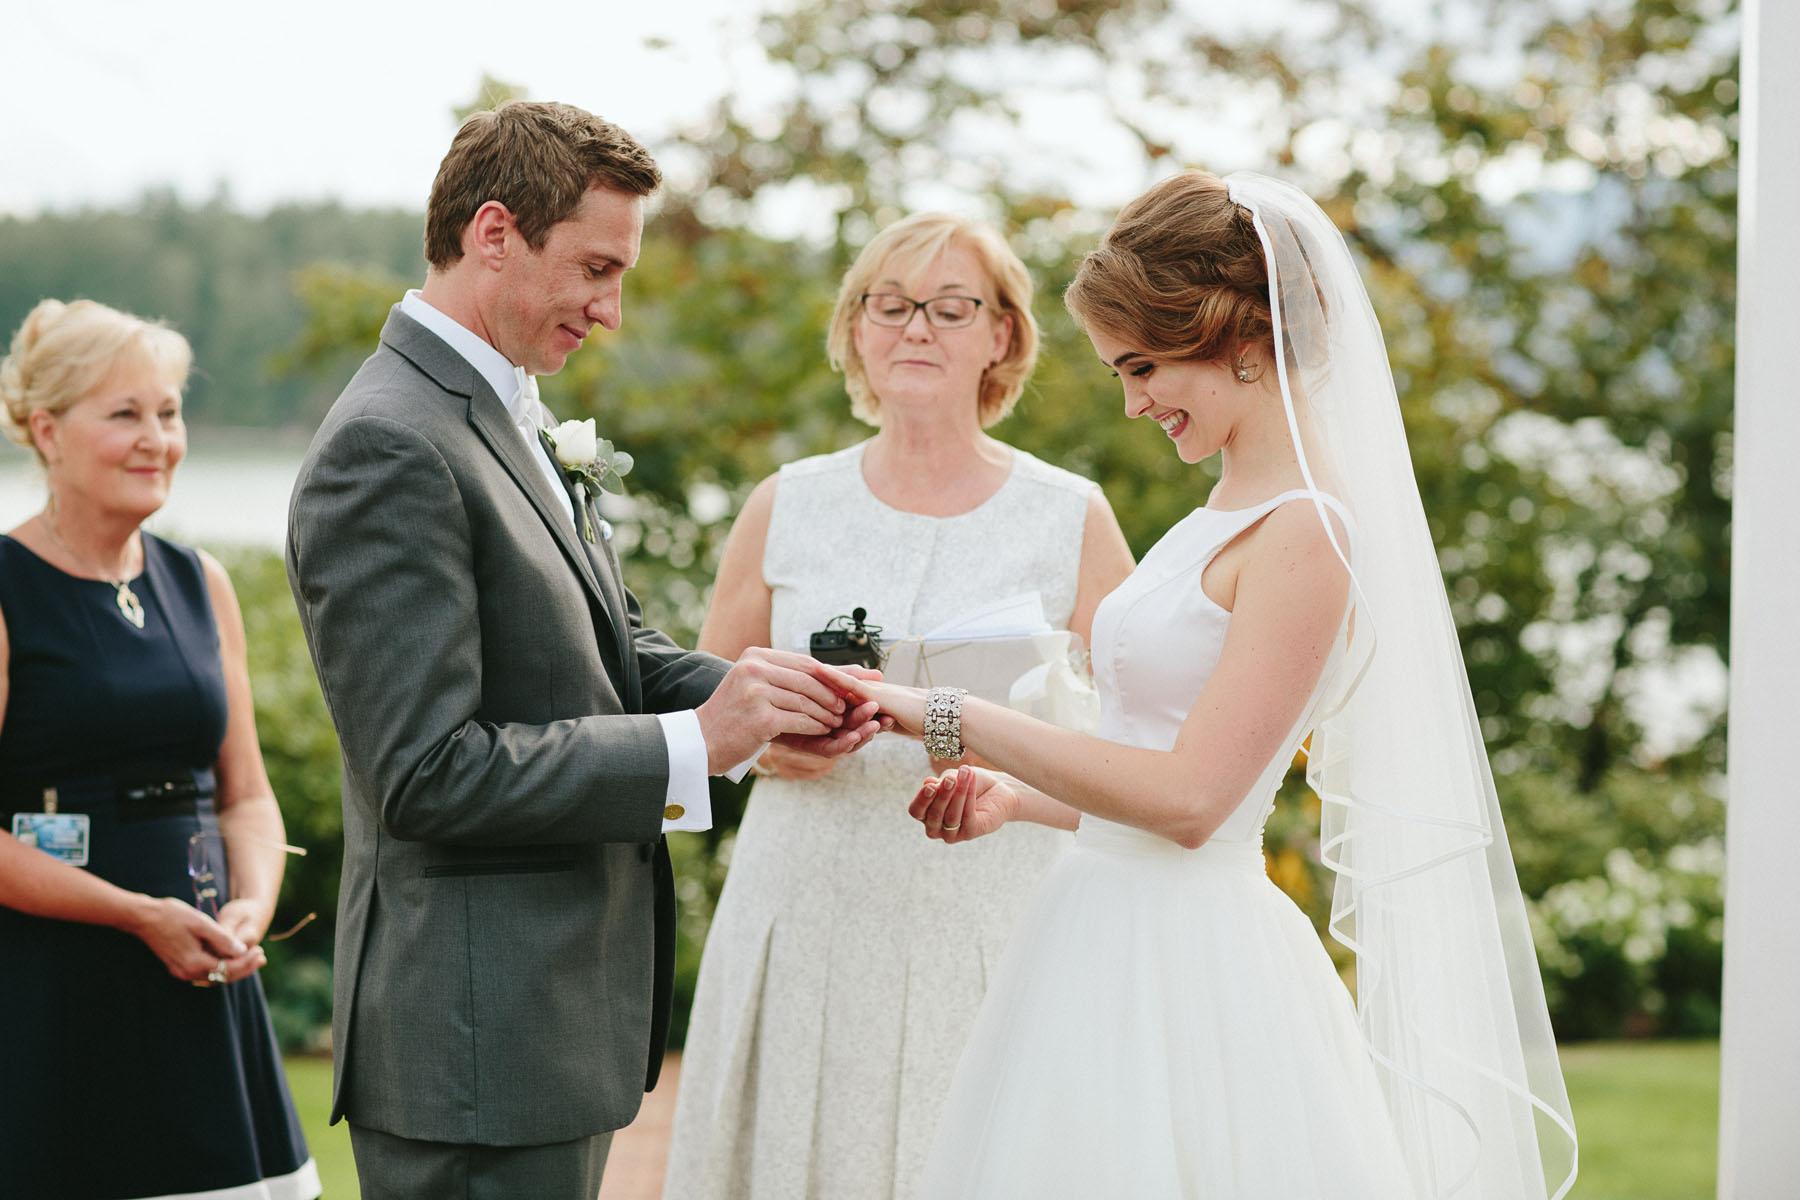 thetis-island-wedding-photographer-rp-rn-092.jpg